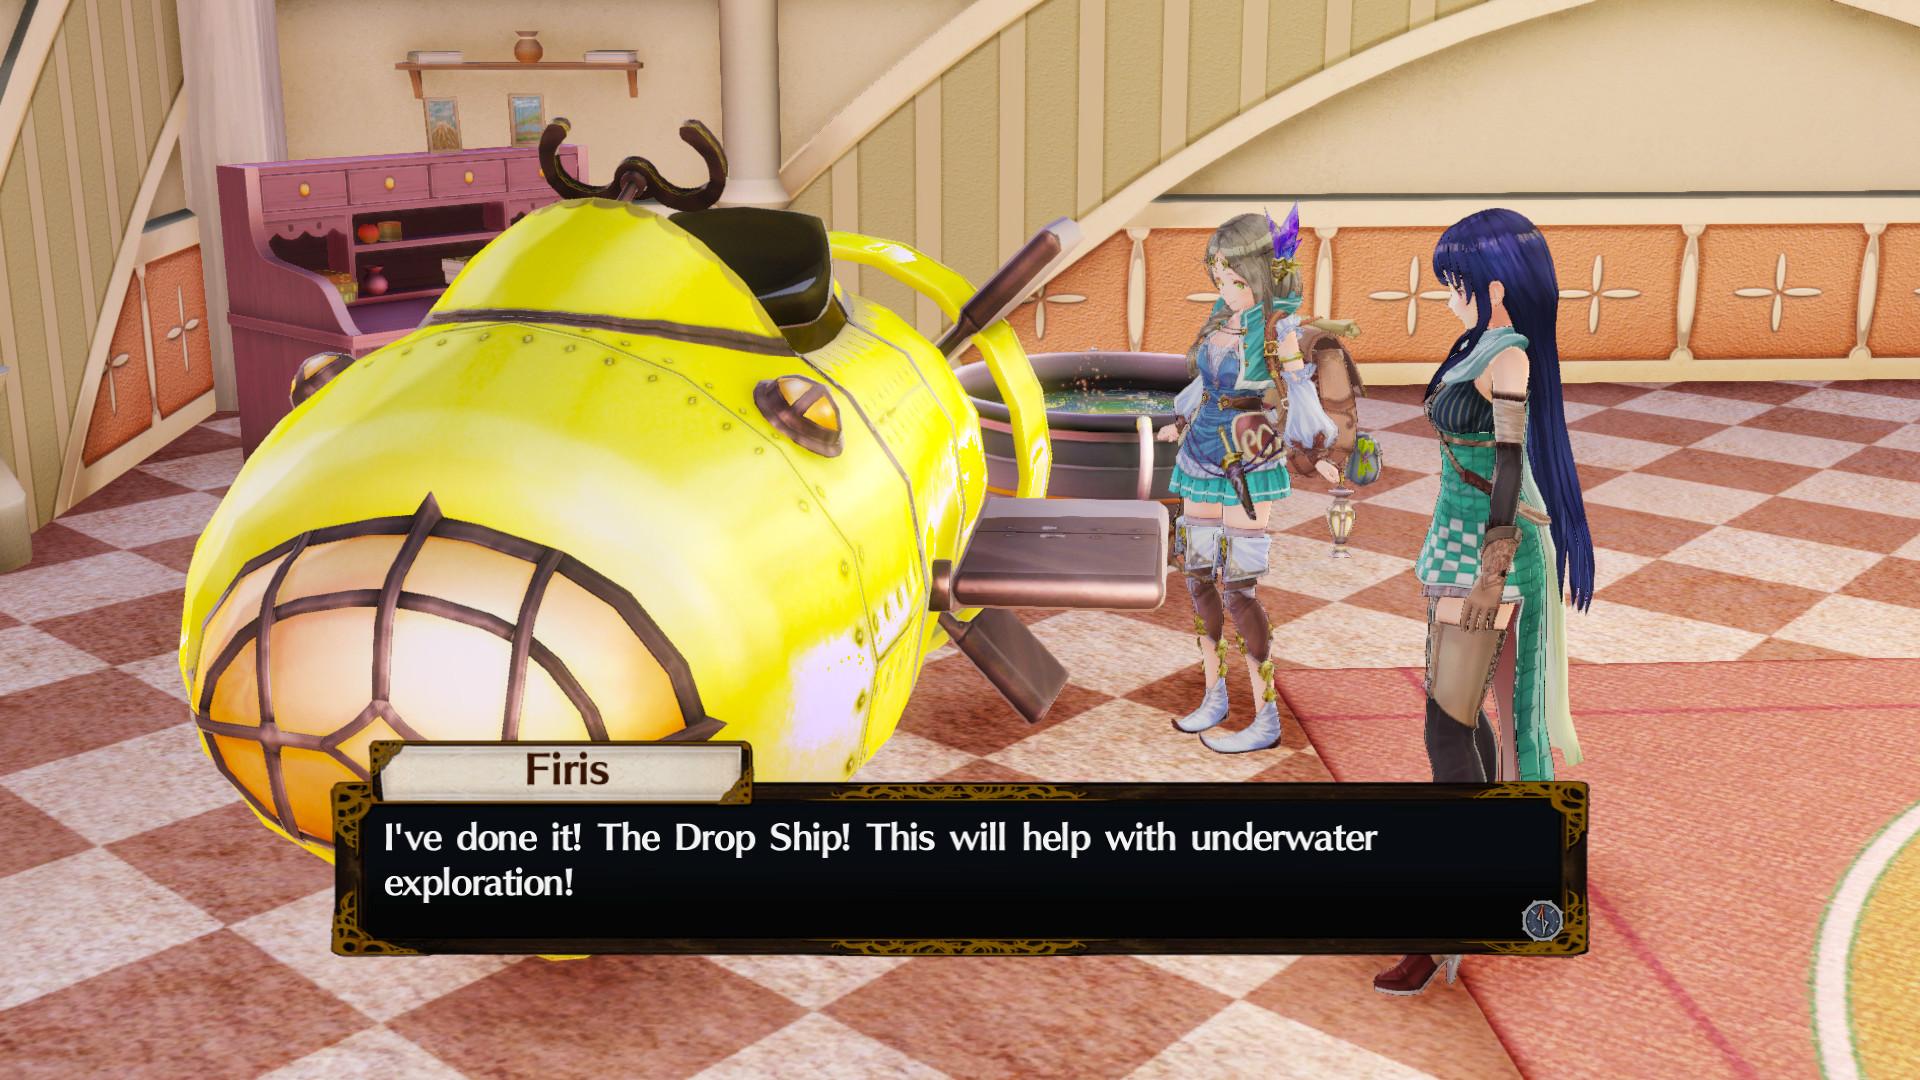 Atelier Firis: The Alchemist and the Mysterious Journey DX PC Key Fiyatları